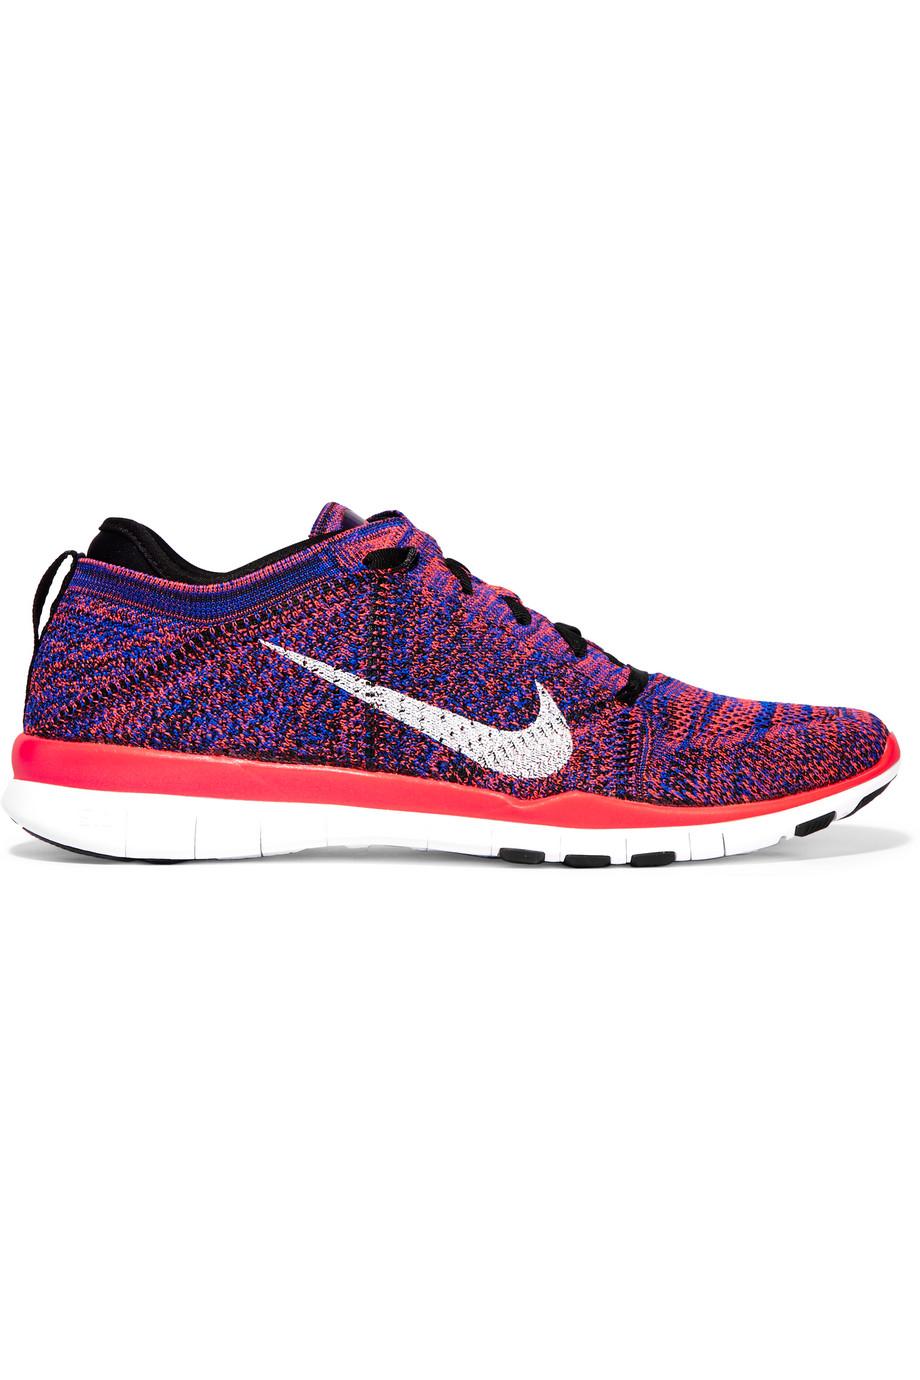 Nike Free 5.0 Mesh Sneakers, Blue, Women's, Size: 6